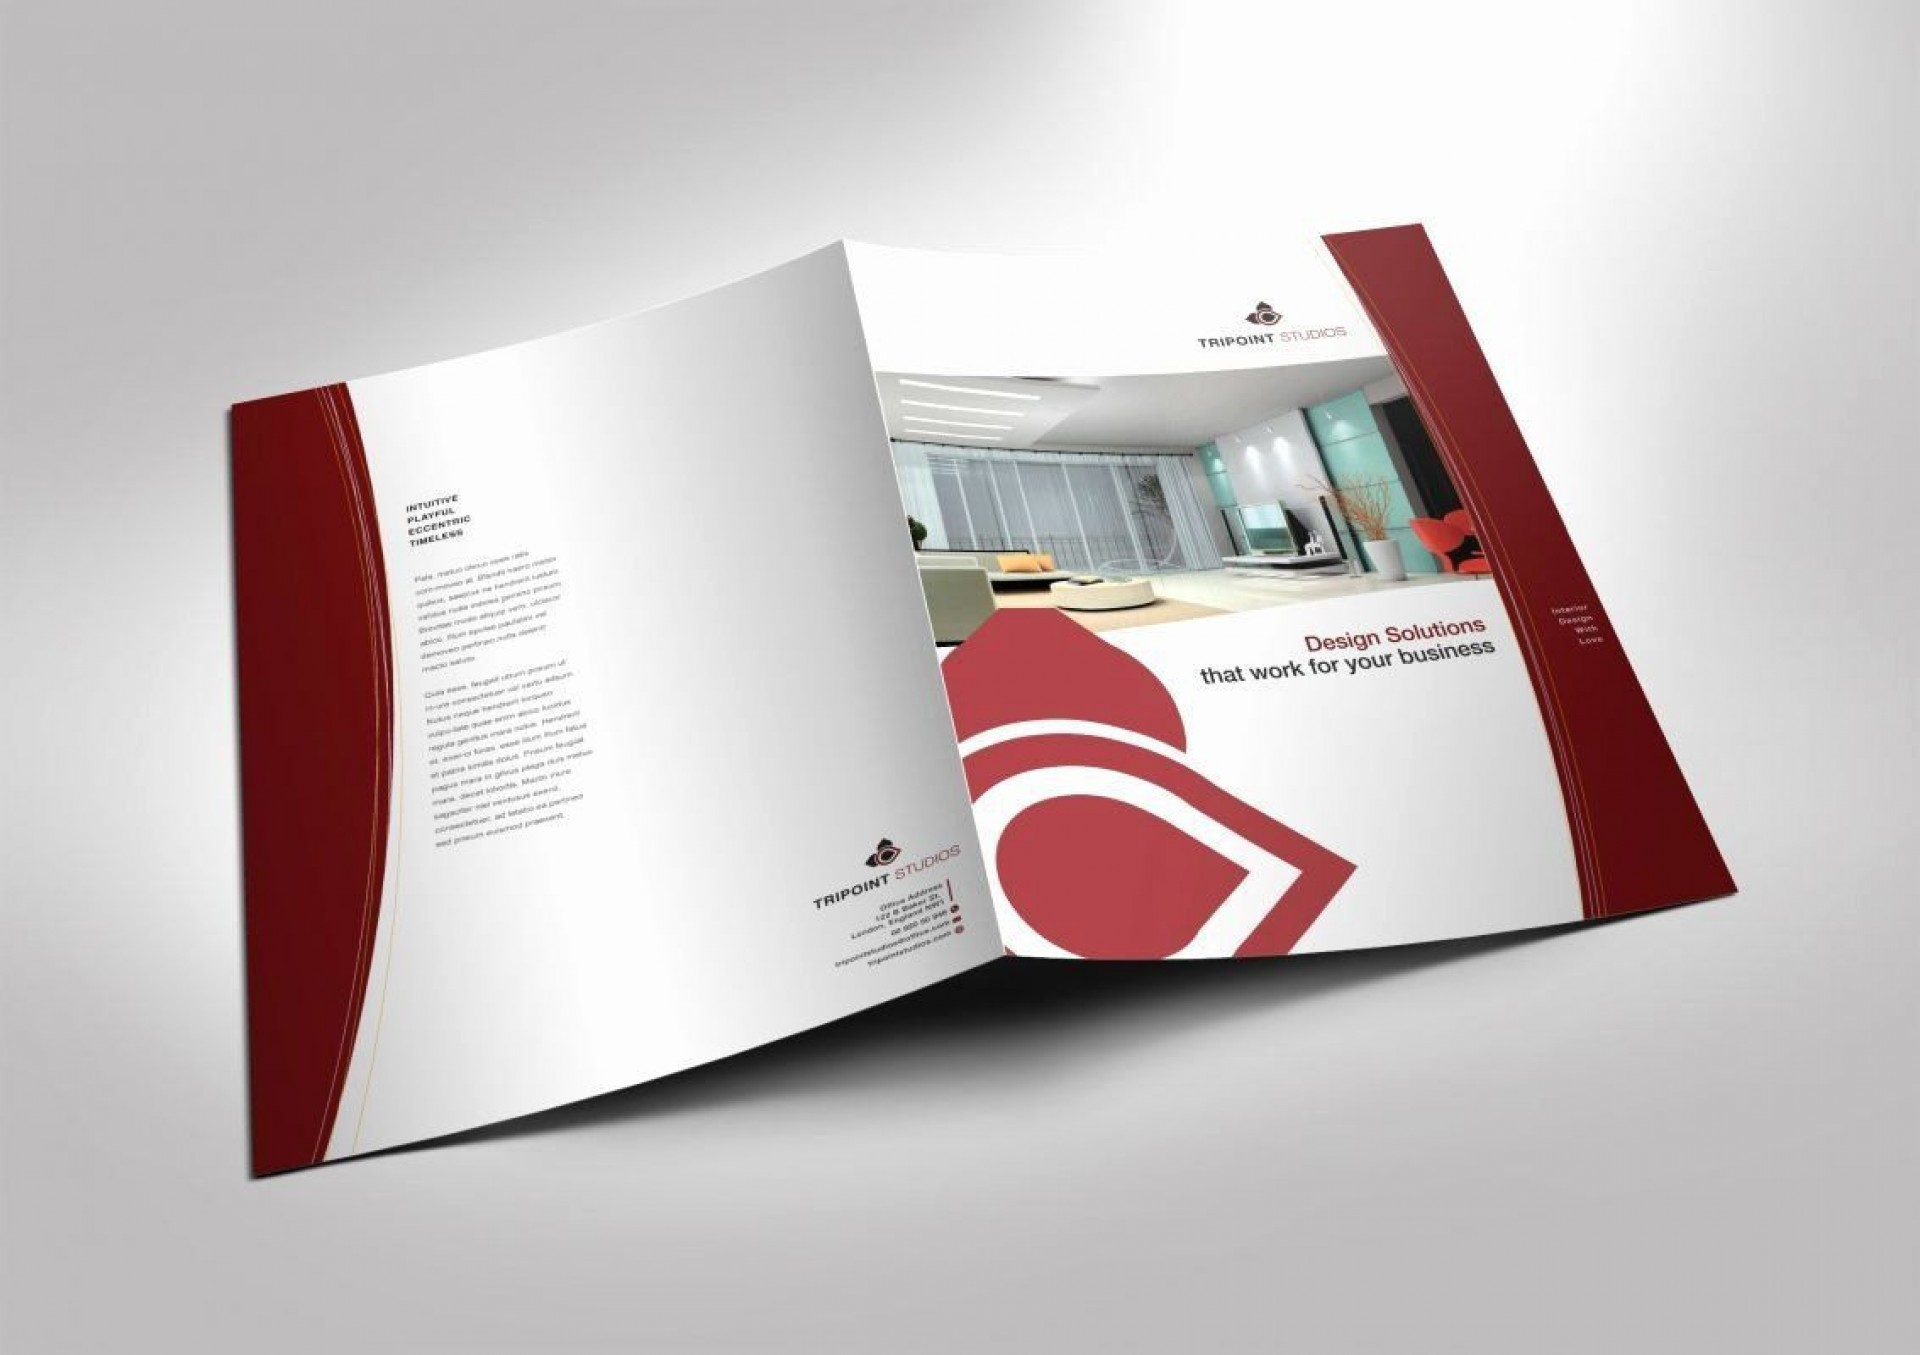 001 Surprising Half Fold Brochure Template High Resolution  Free Microsoft Word Indesign1920